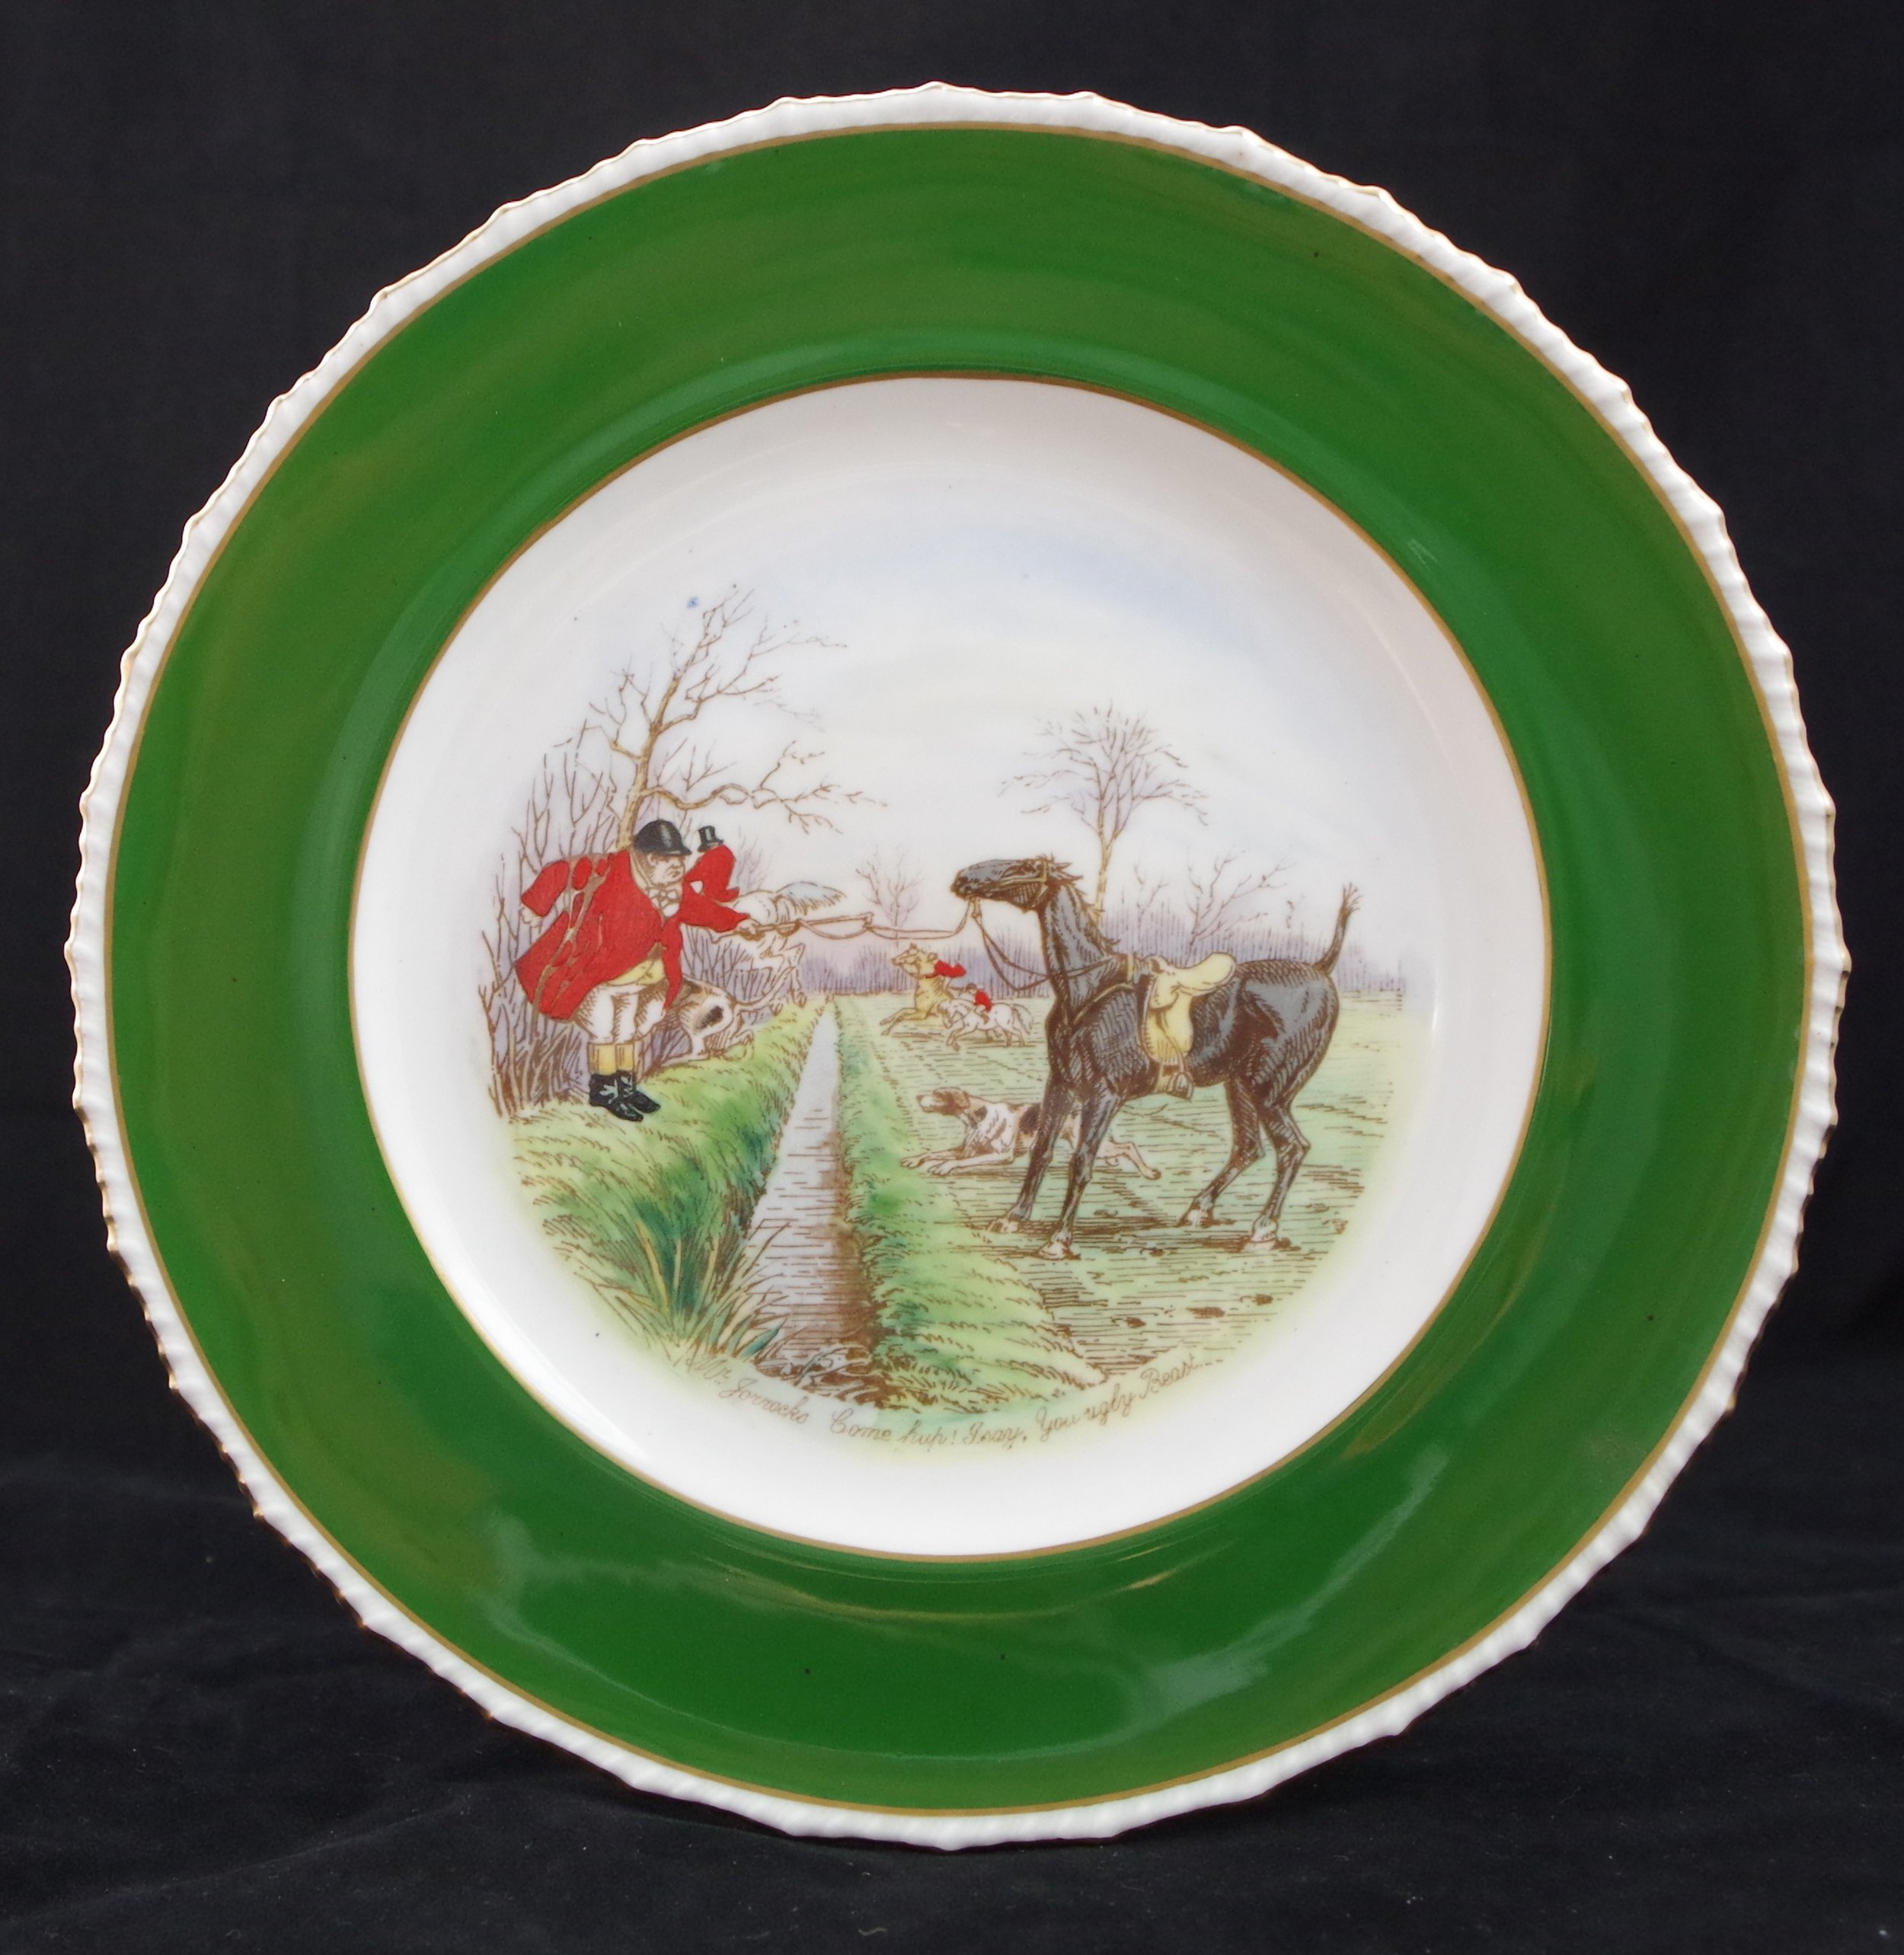 royal-crown-derby-stanhope-siam-green-ground-jorrocks-1